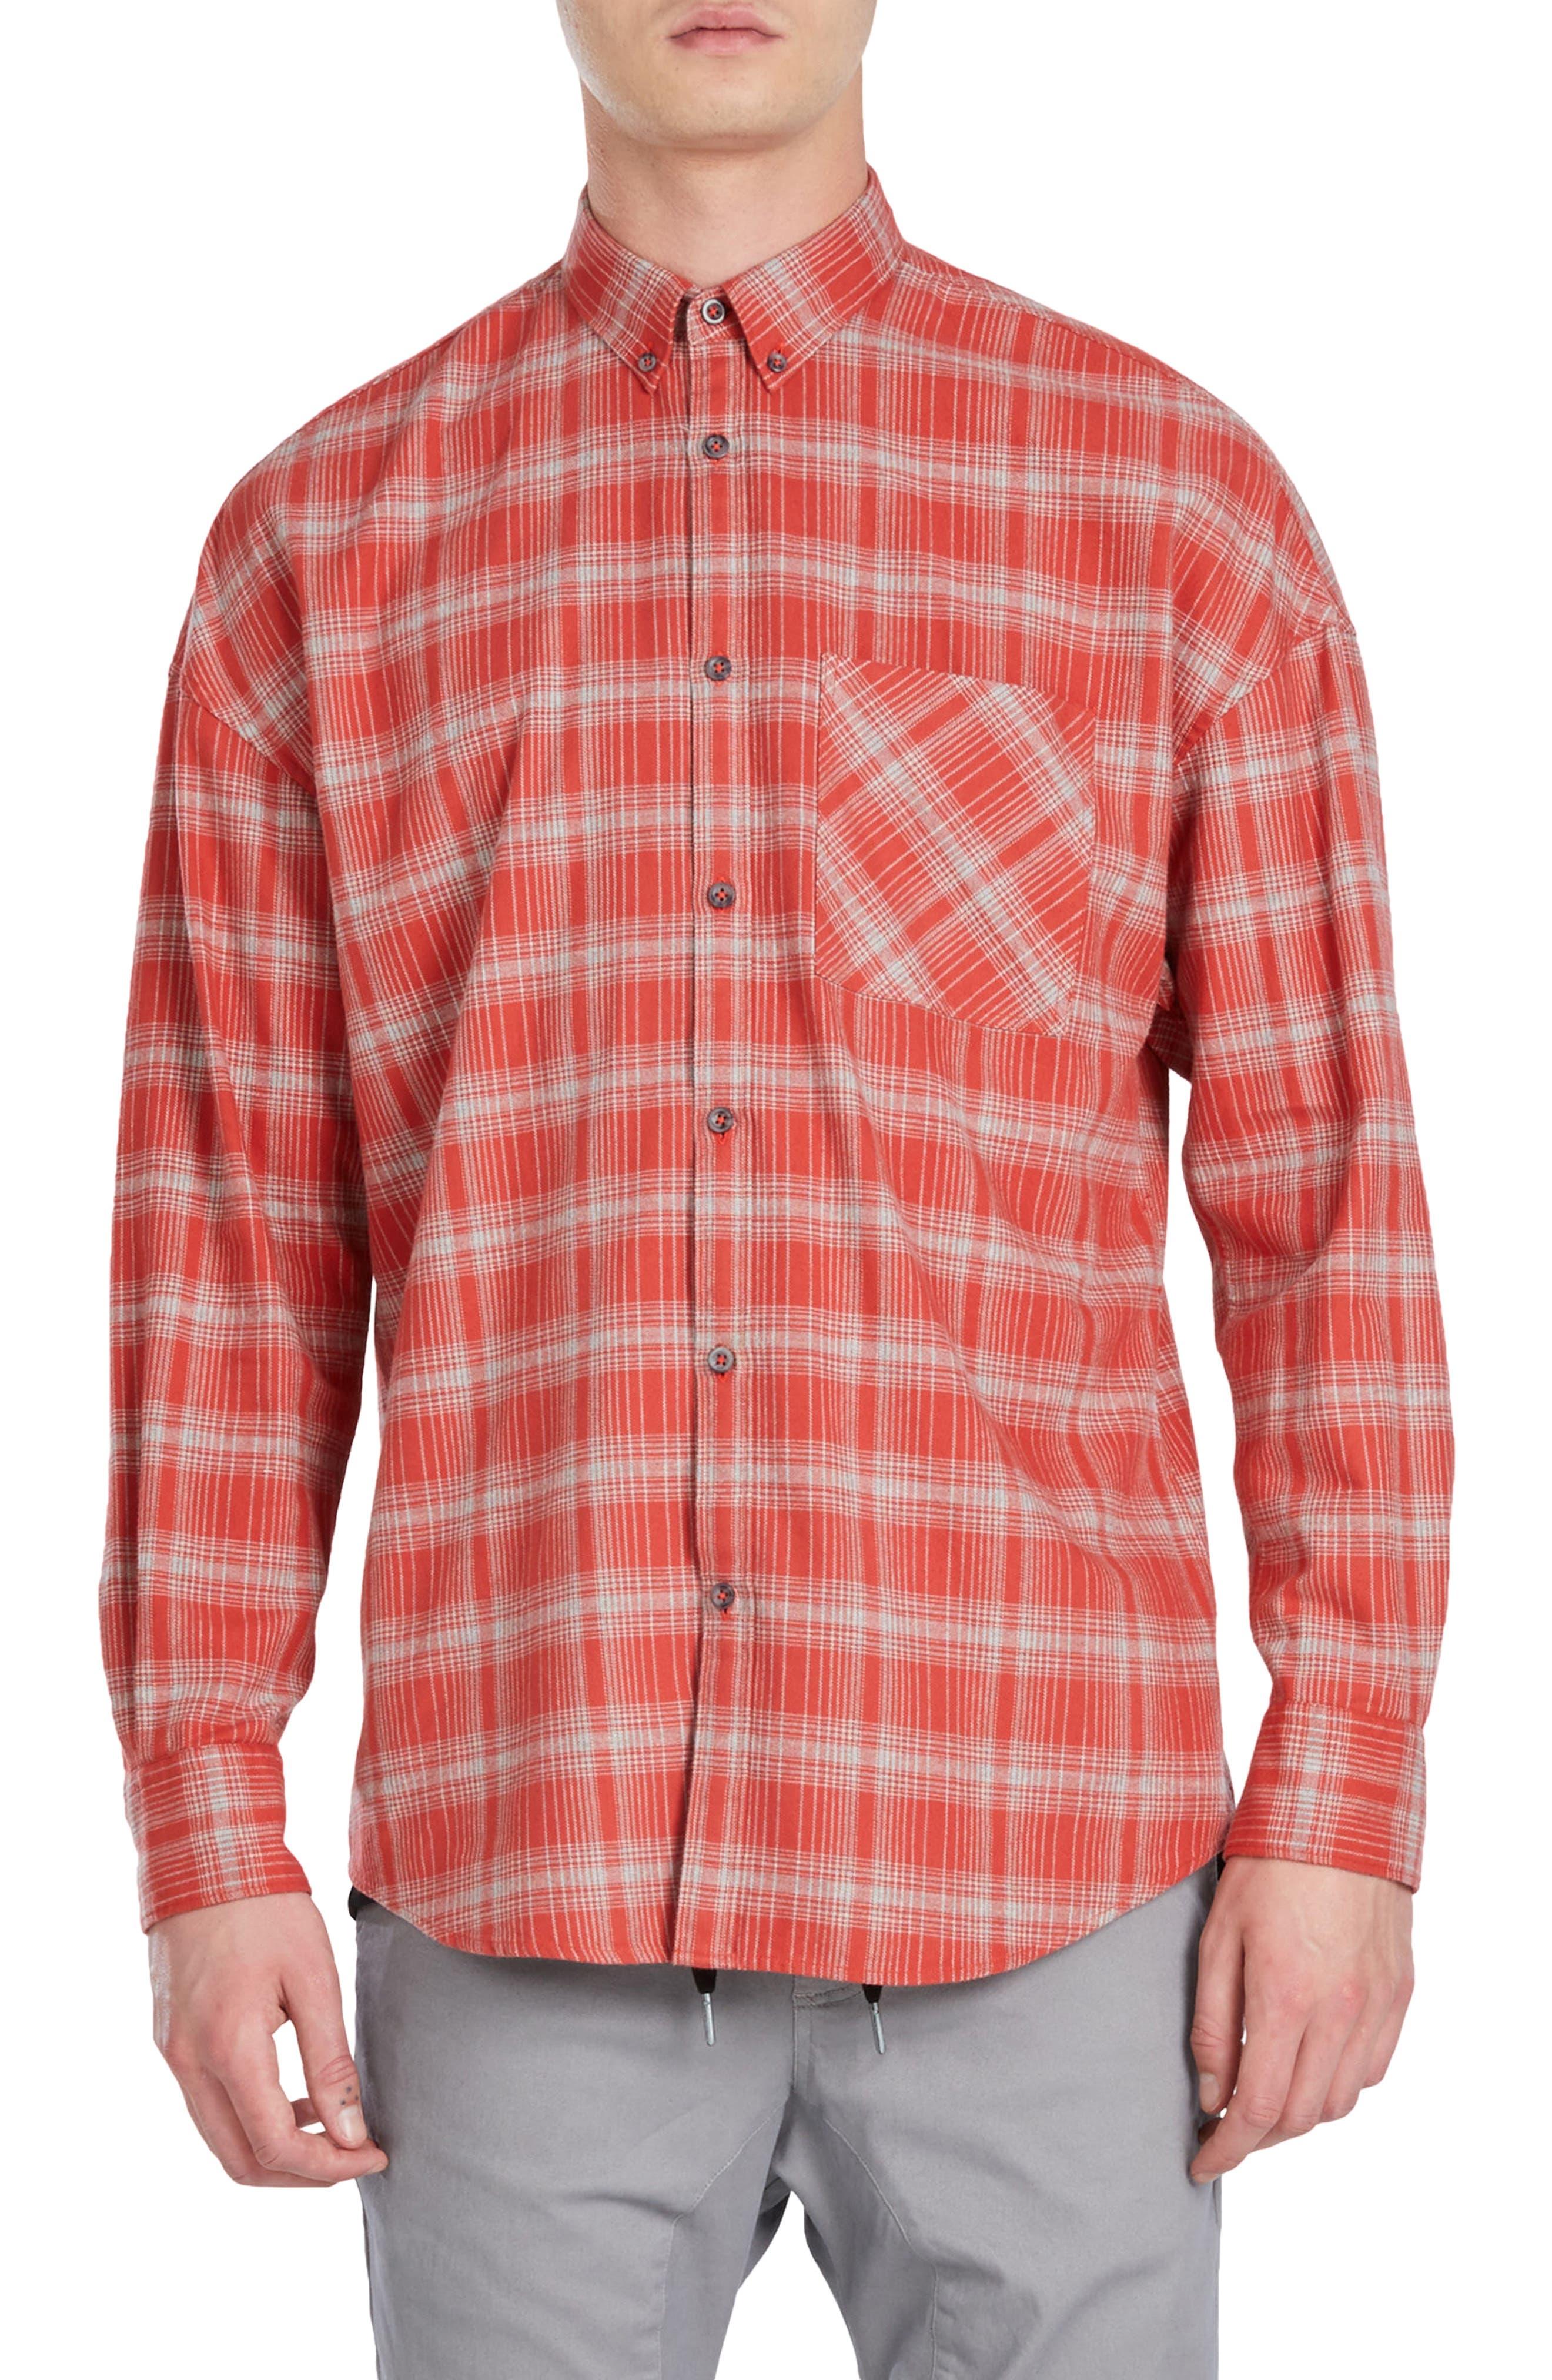 Rugger Plaid Sport Shirt,                             Main thumbnail 1, color,                             641